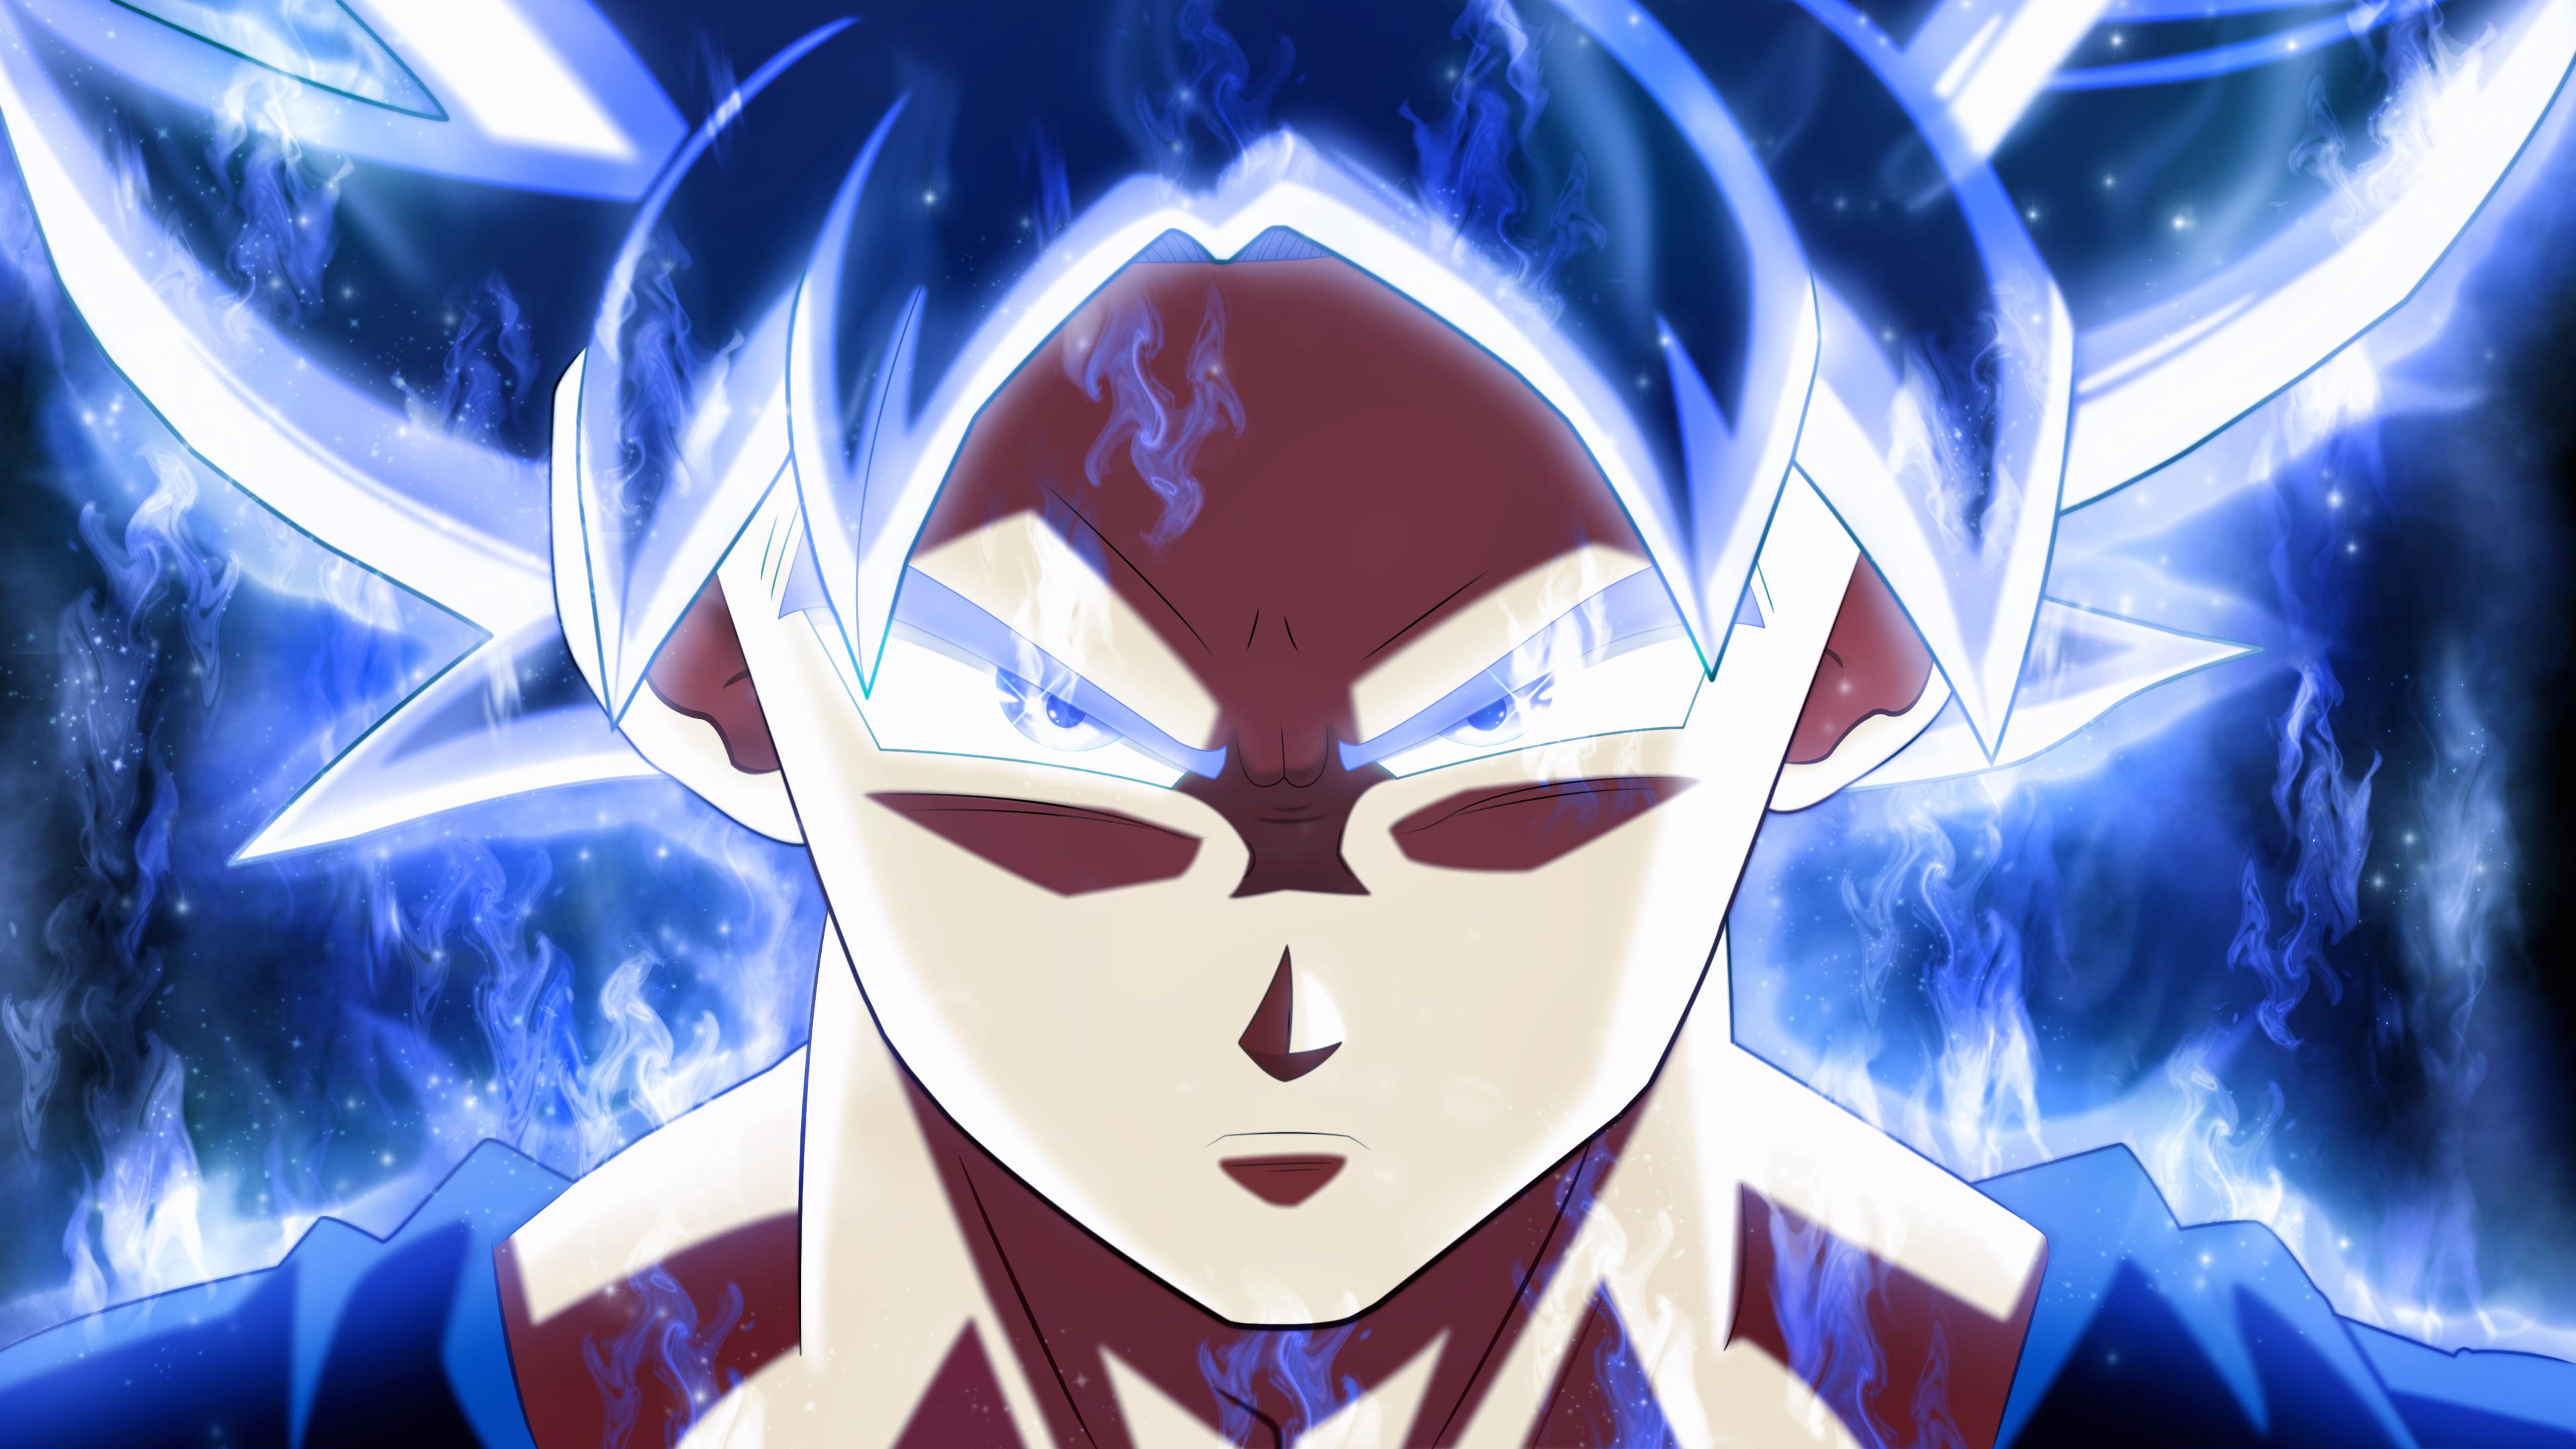 son goku dragon ball super 4k 1541974379 - Son Goku Dragon Ball Super 4k - hd-wallpapers, goku wallpapers, dragon ball wallpapers, dragon ball super wallpapers, anime wallpapers, 4k-wallpapers